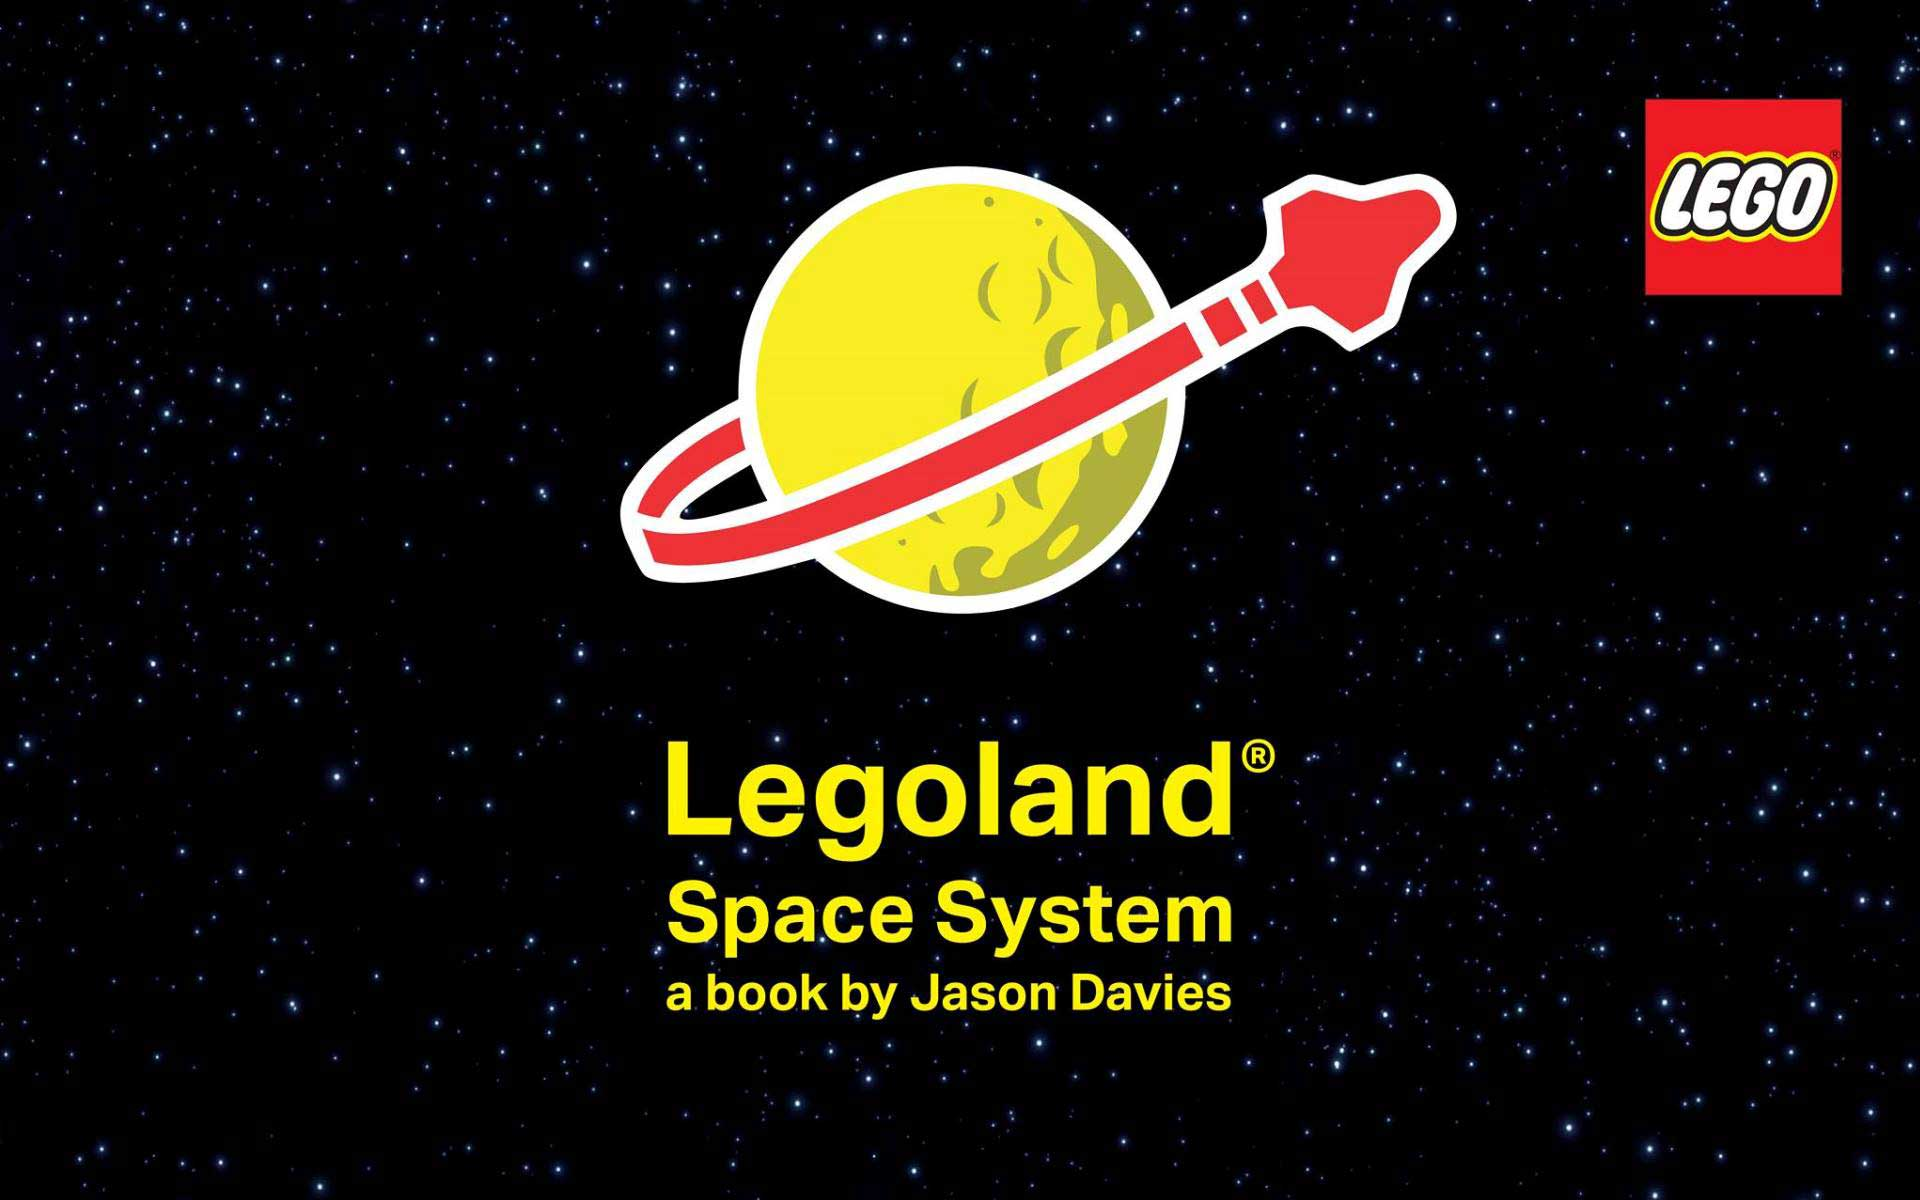 LEGOLAND Space System